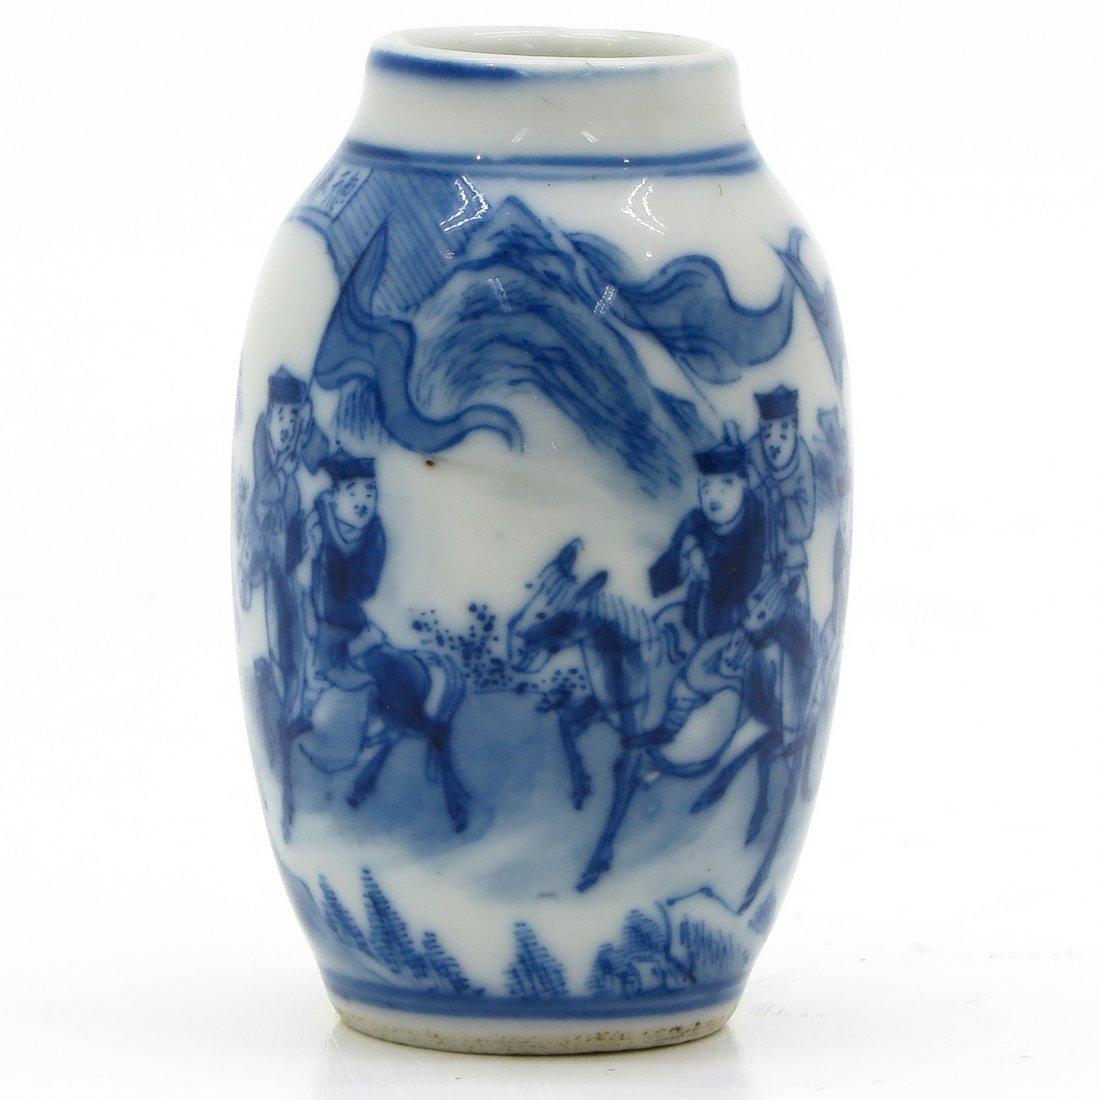 18th Century China Porcelain Miniature Vase